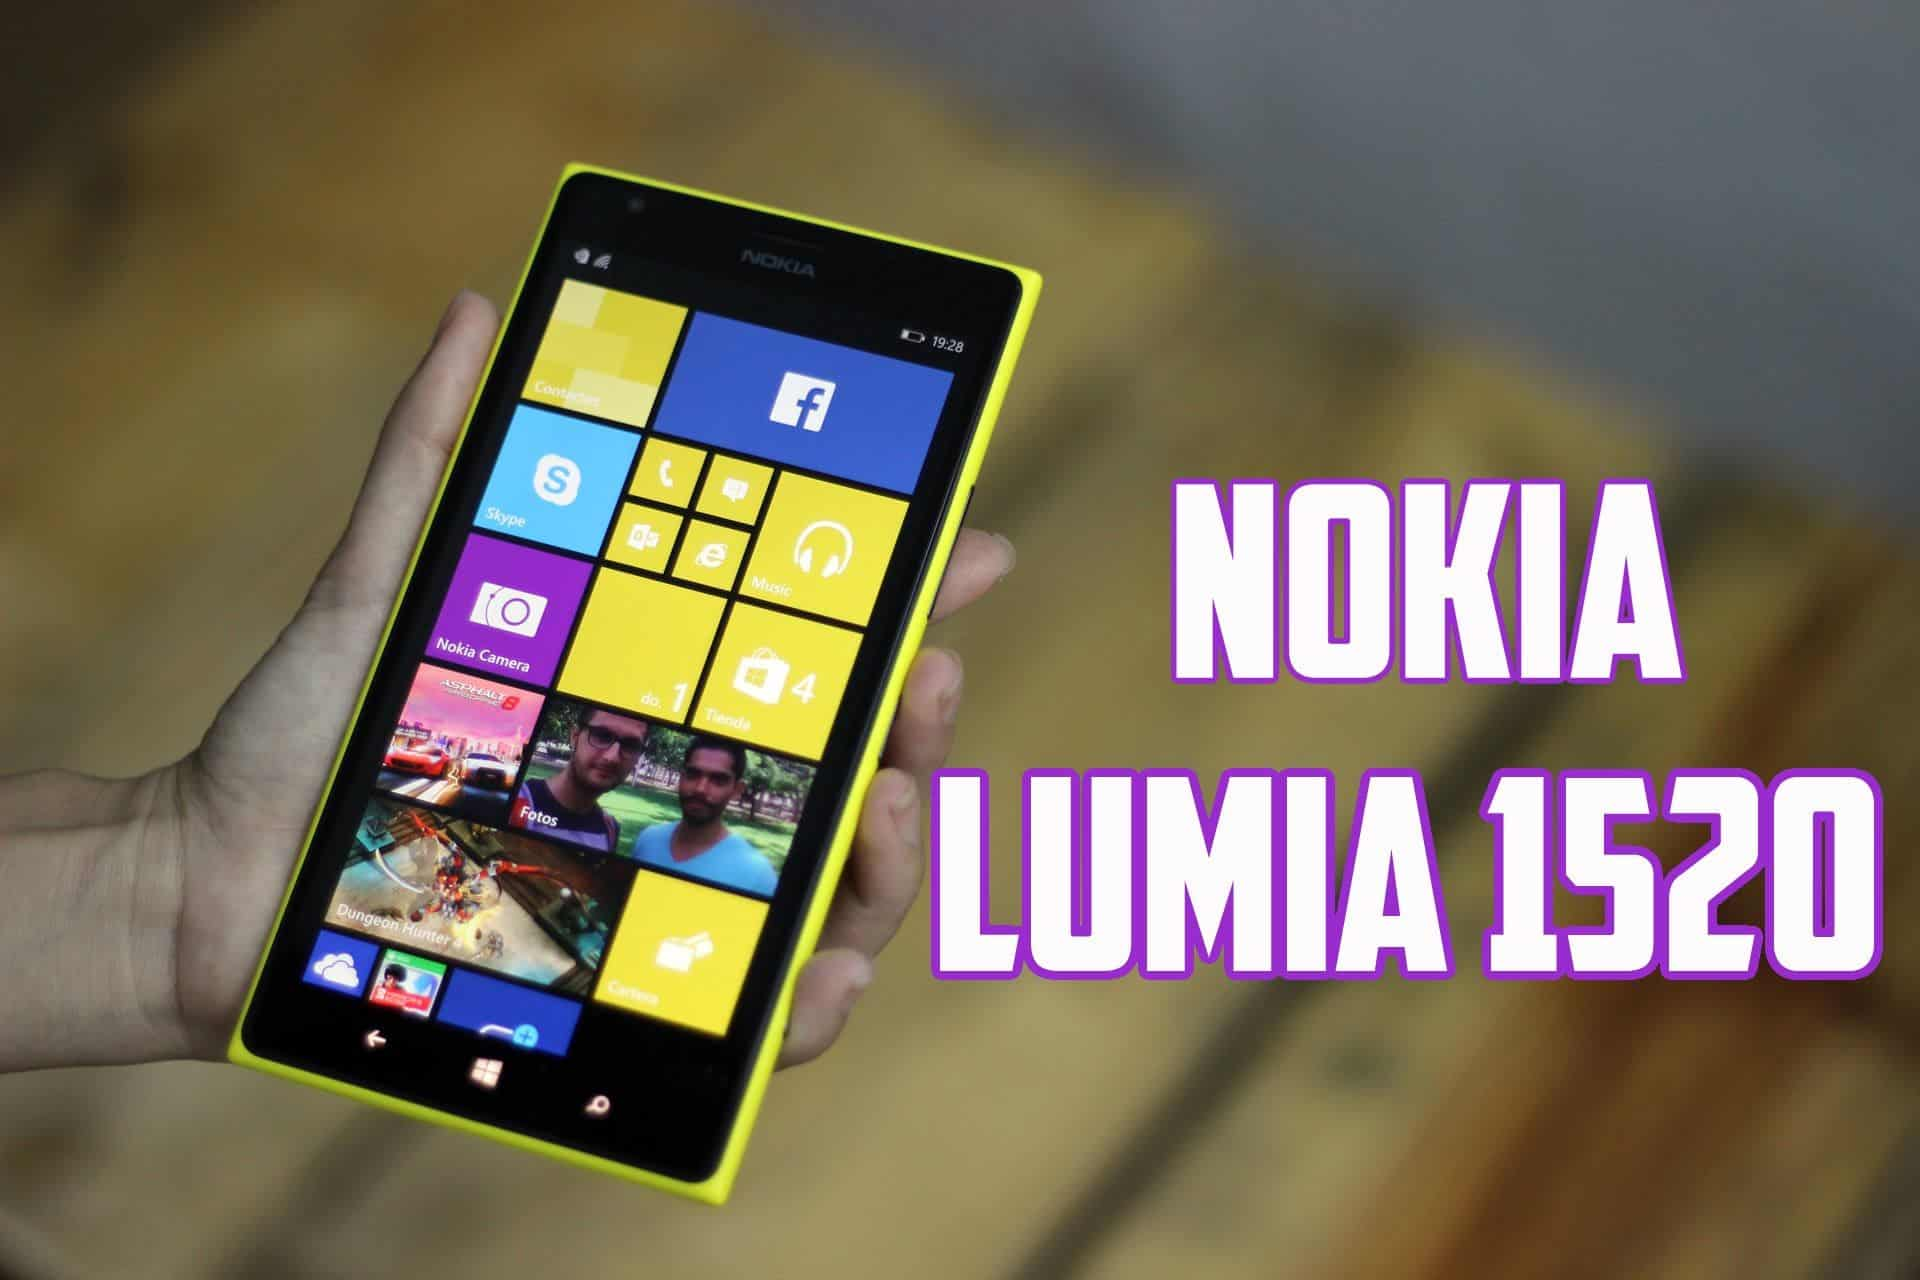 Reset doogee microsoft lumia 640 xl lte dual sim name transmitter huawei nokia mobile e72